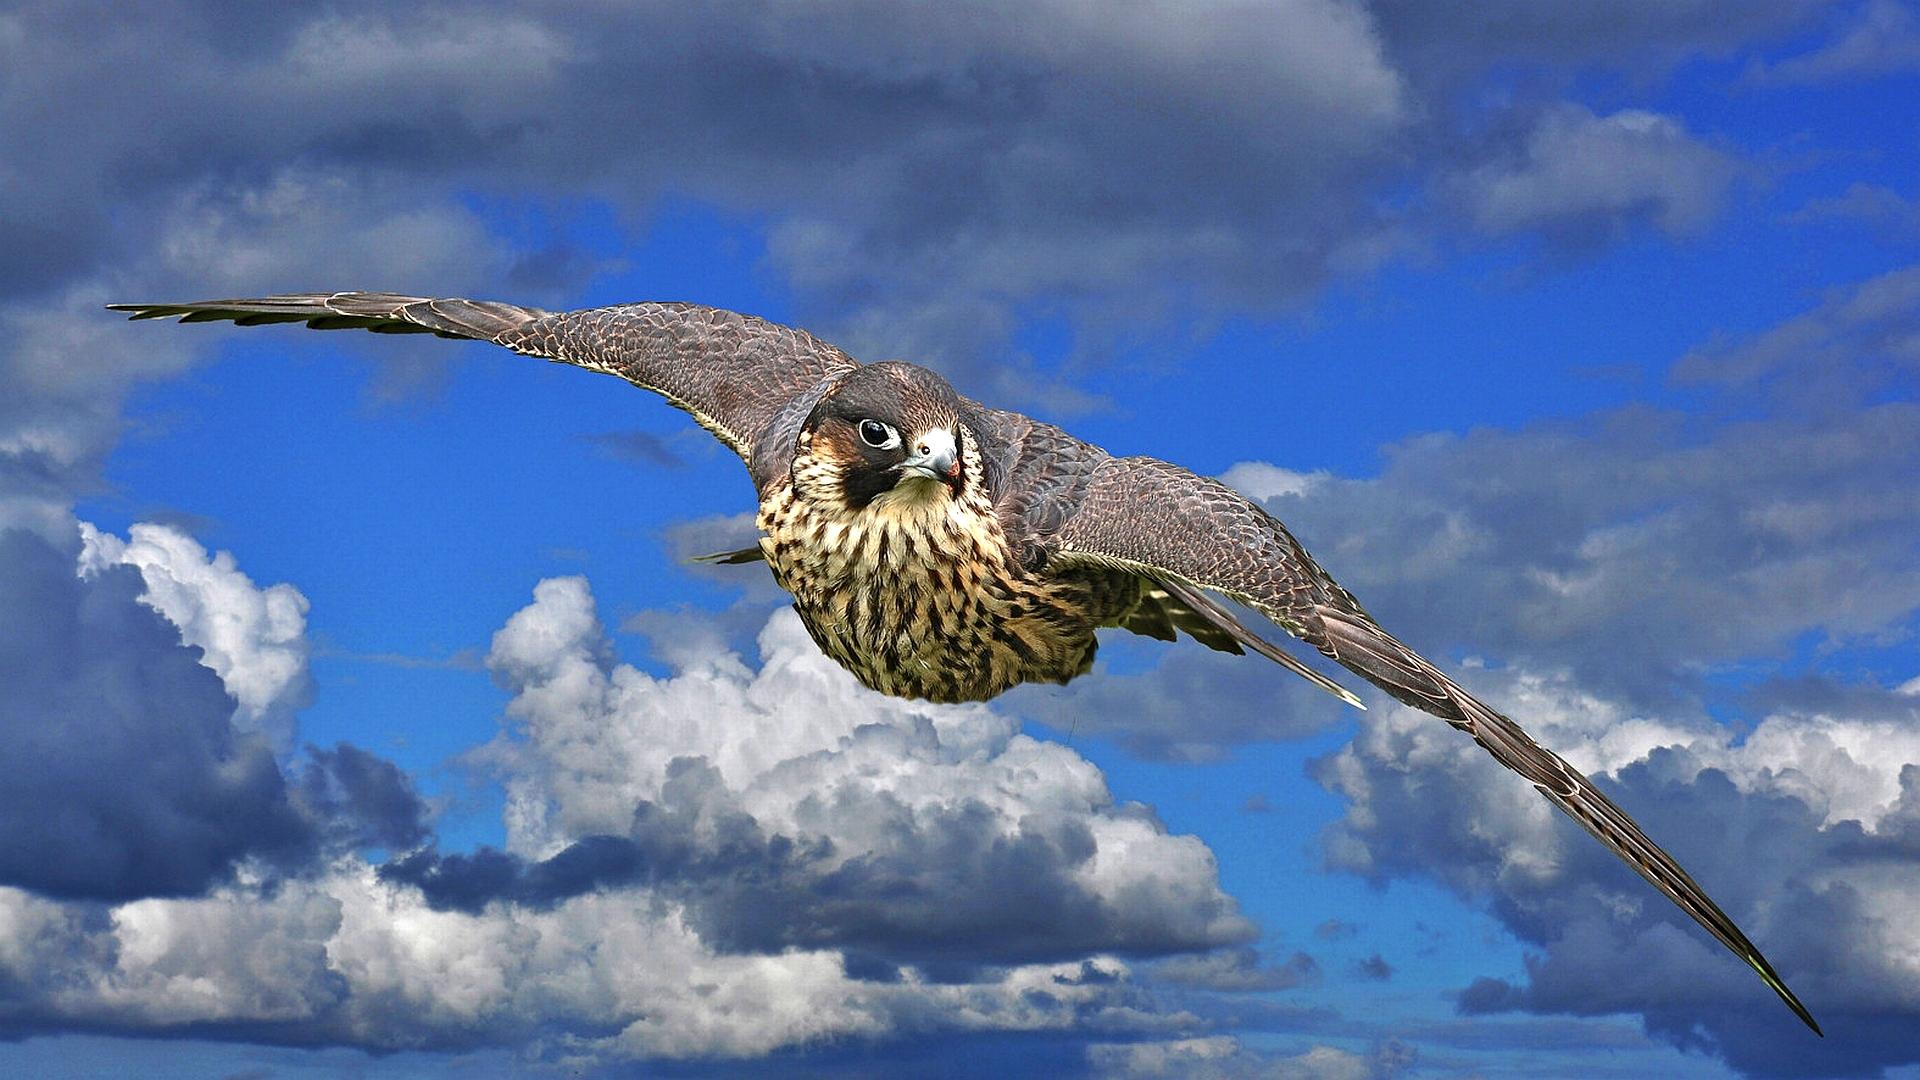 природа птица небо Ястреб без смс